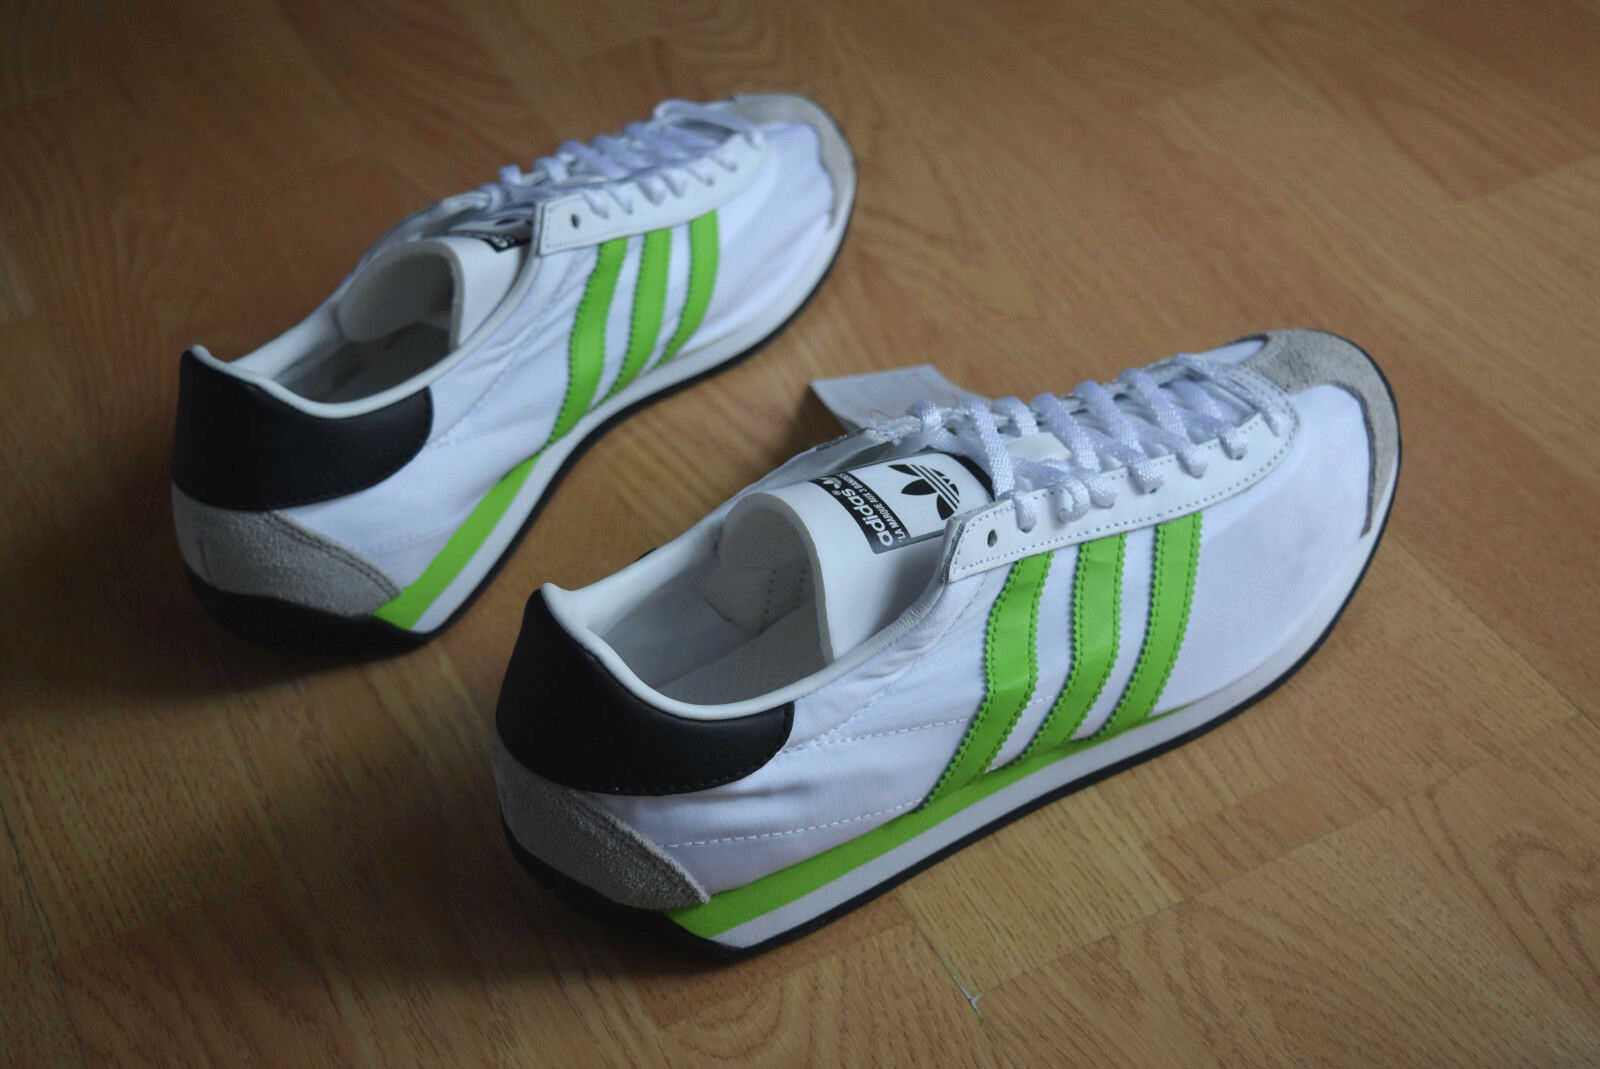 adidas Country OG 40,5 42 48,5 43 44,5 46 47 48,5 42 rom zx SL la trAineR gazelle S79109 3acd9e